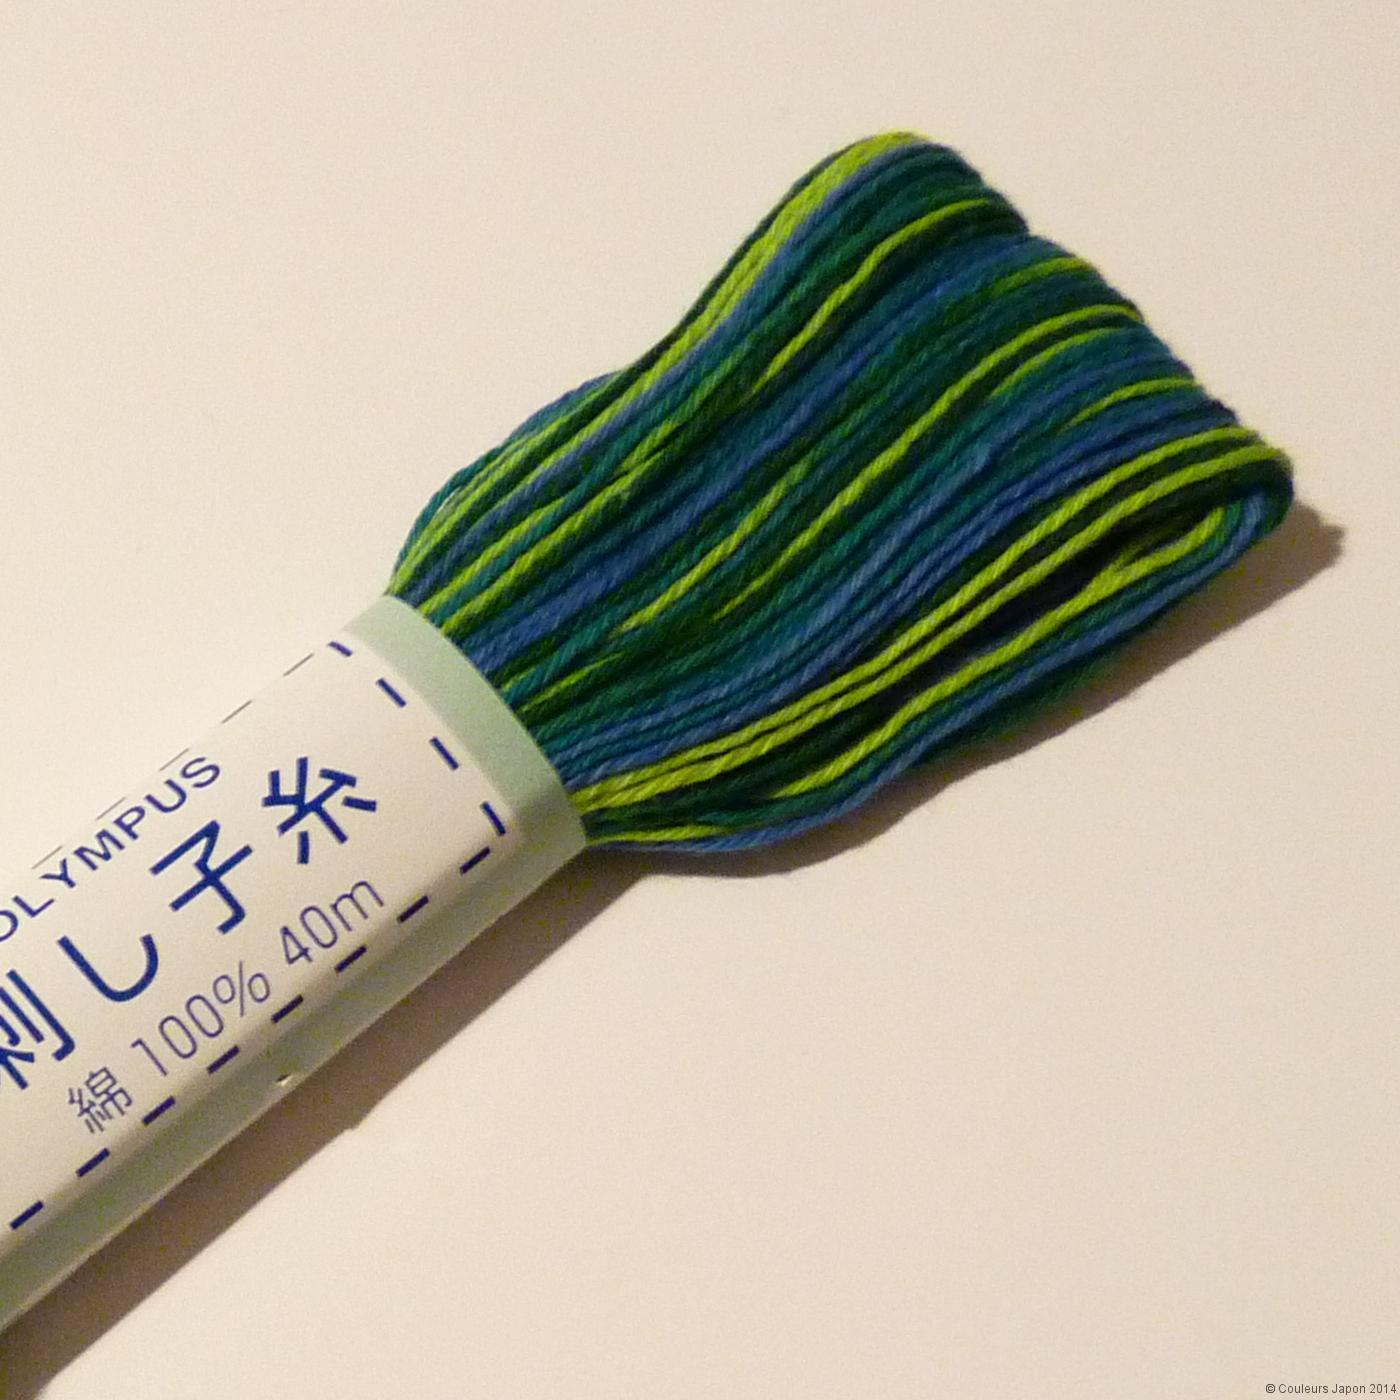 Fil sashiko mix de bleus et verts